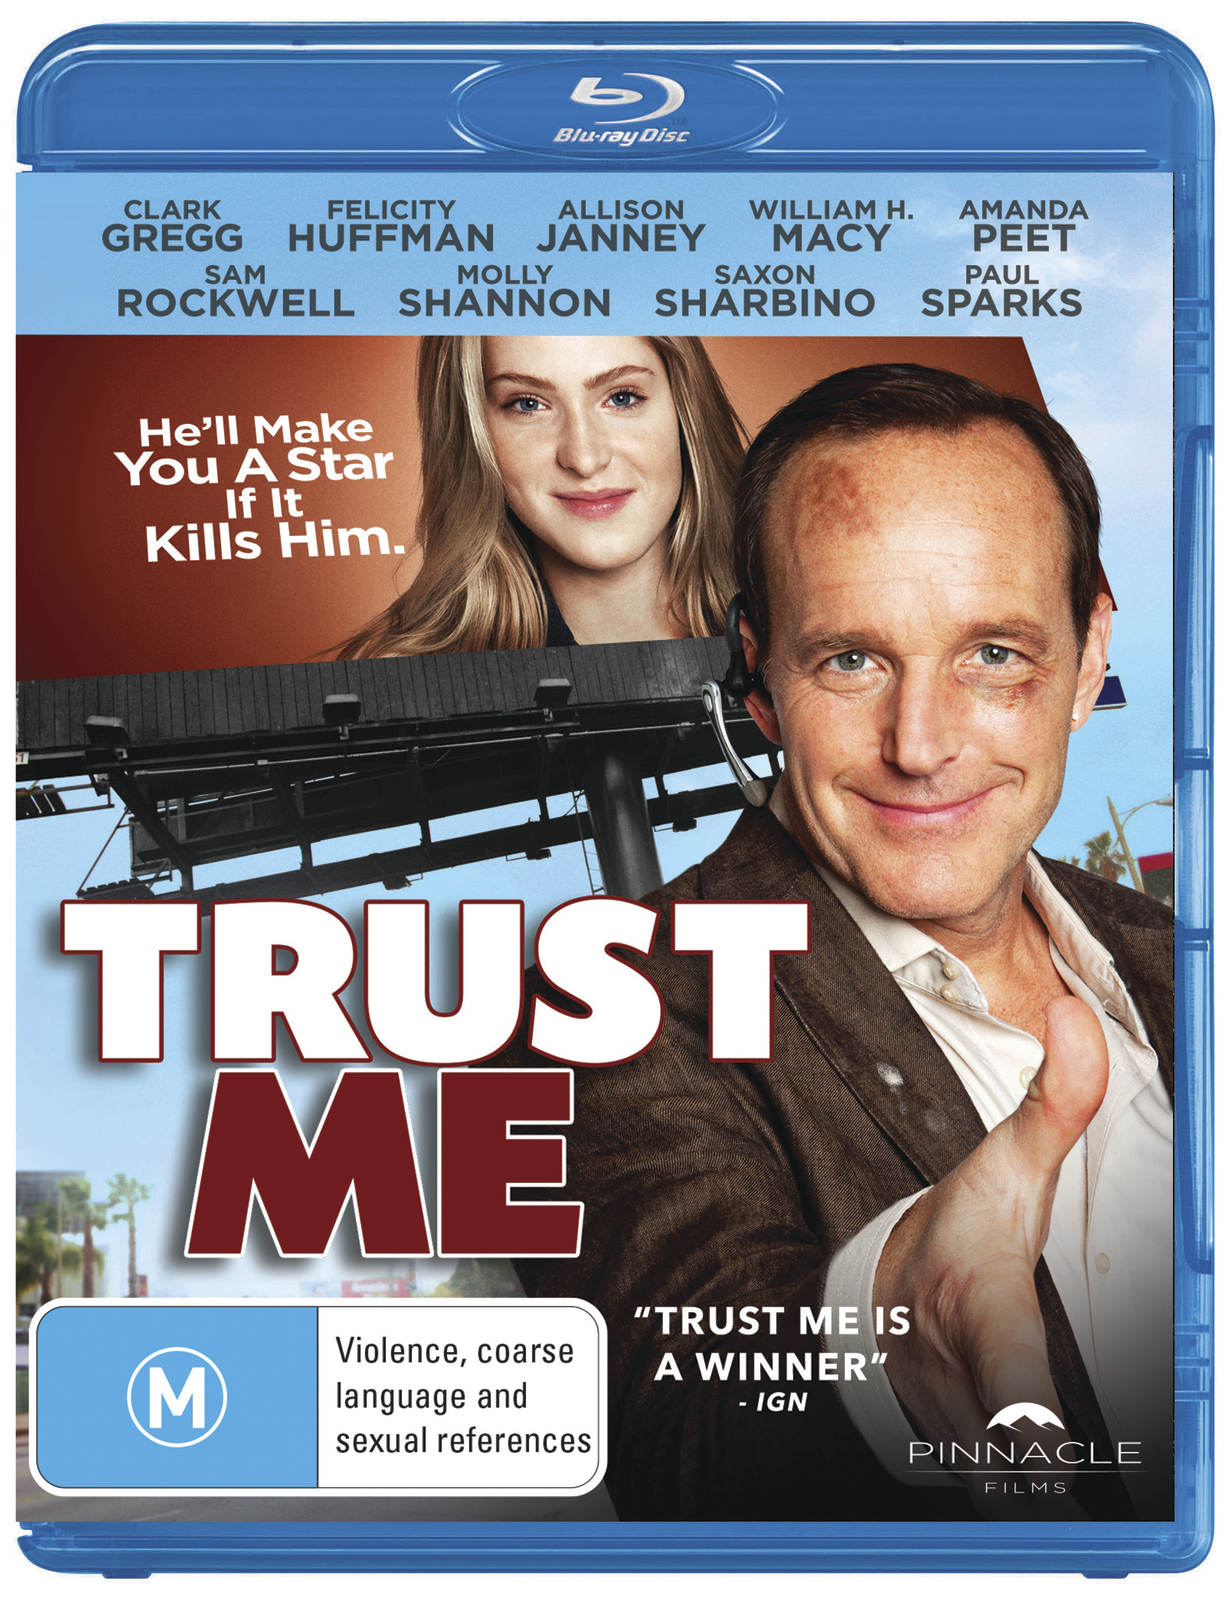 Trust Me on Blu-ray image